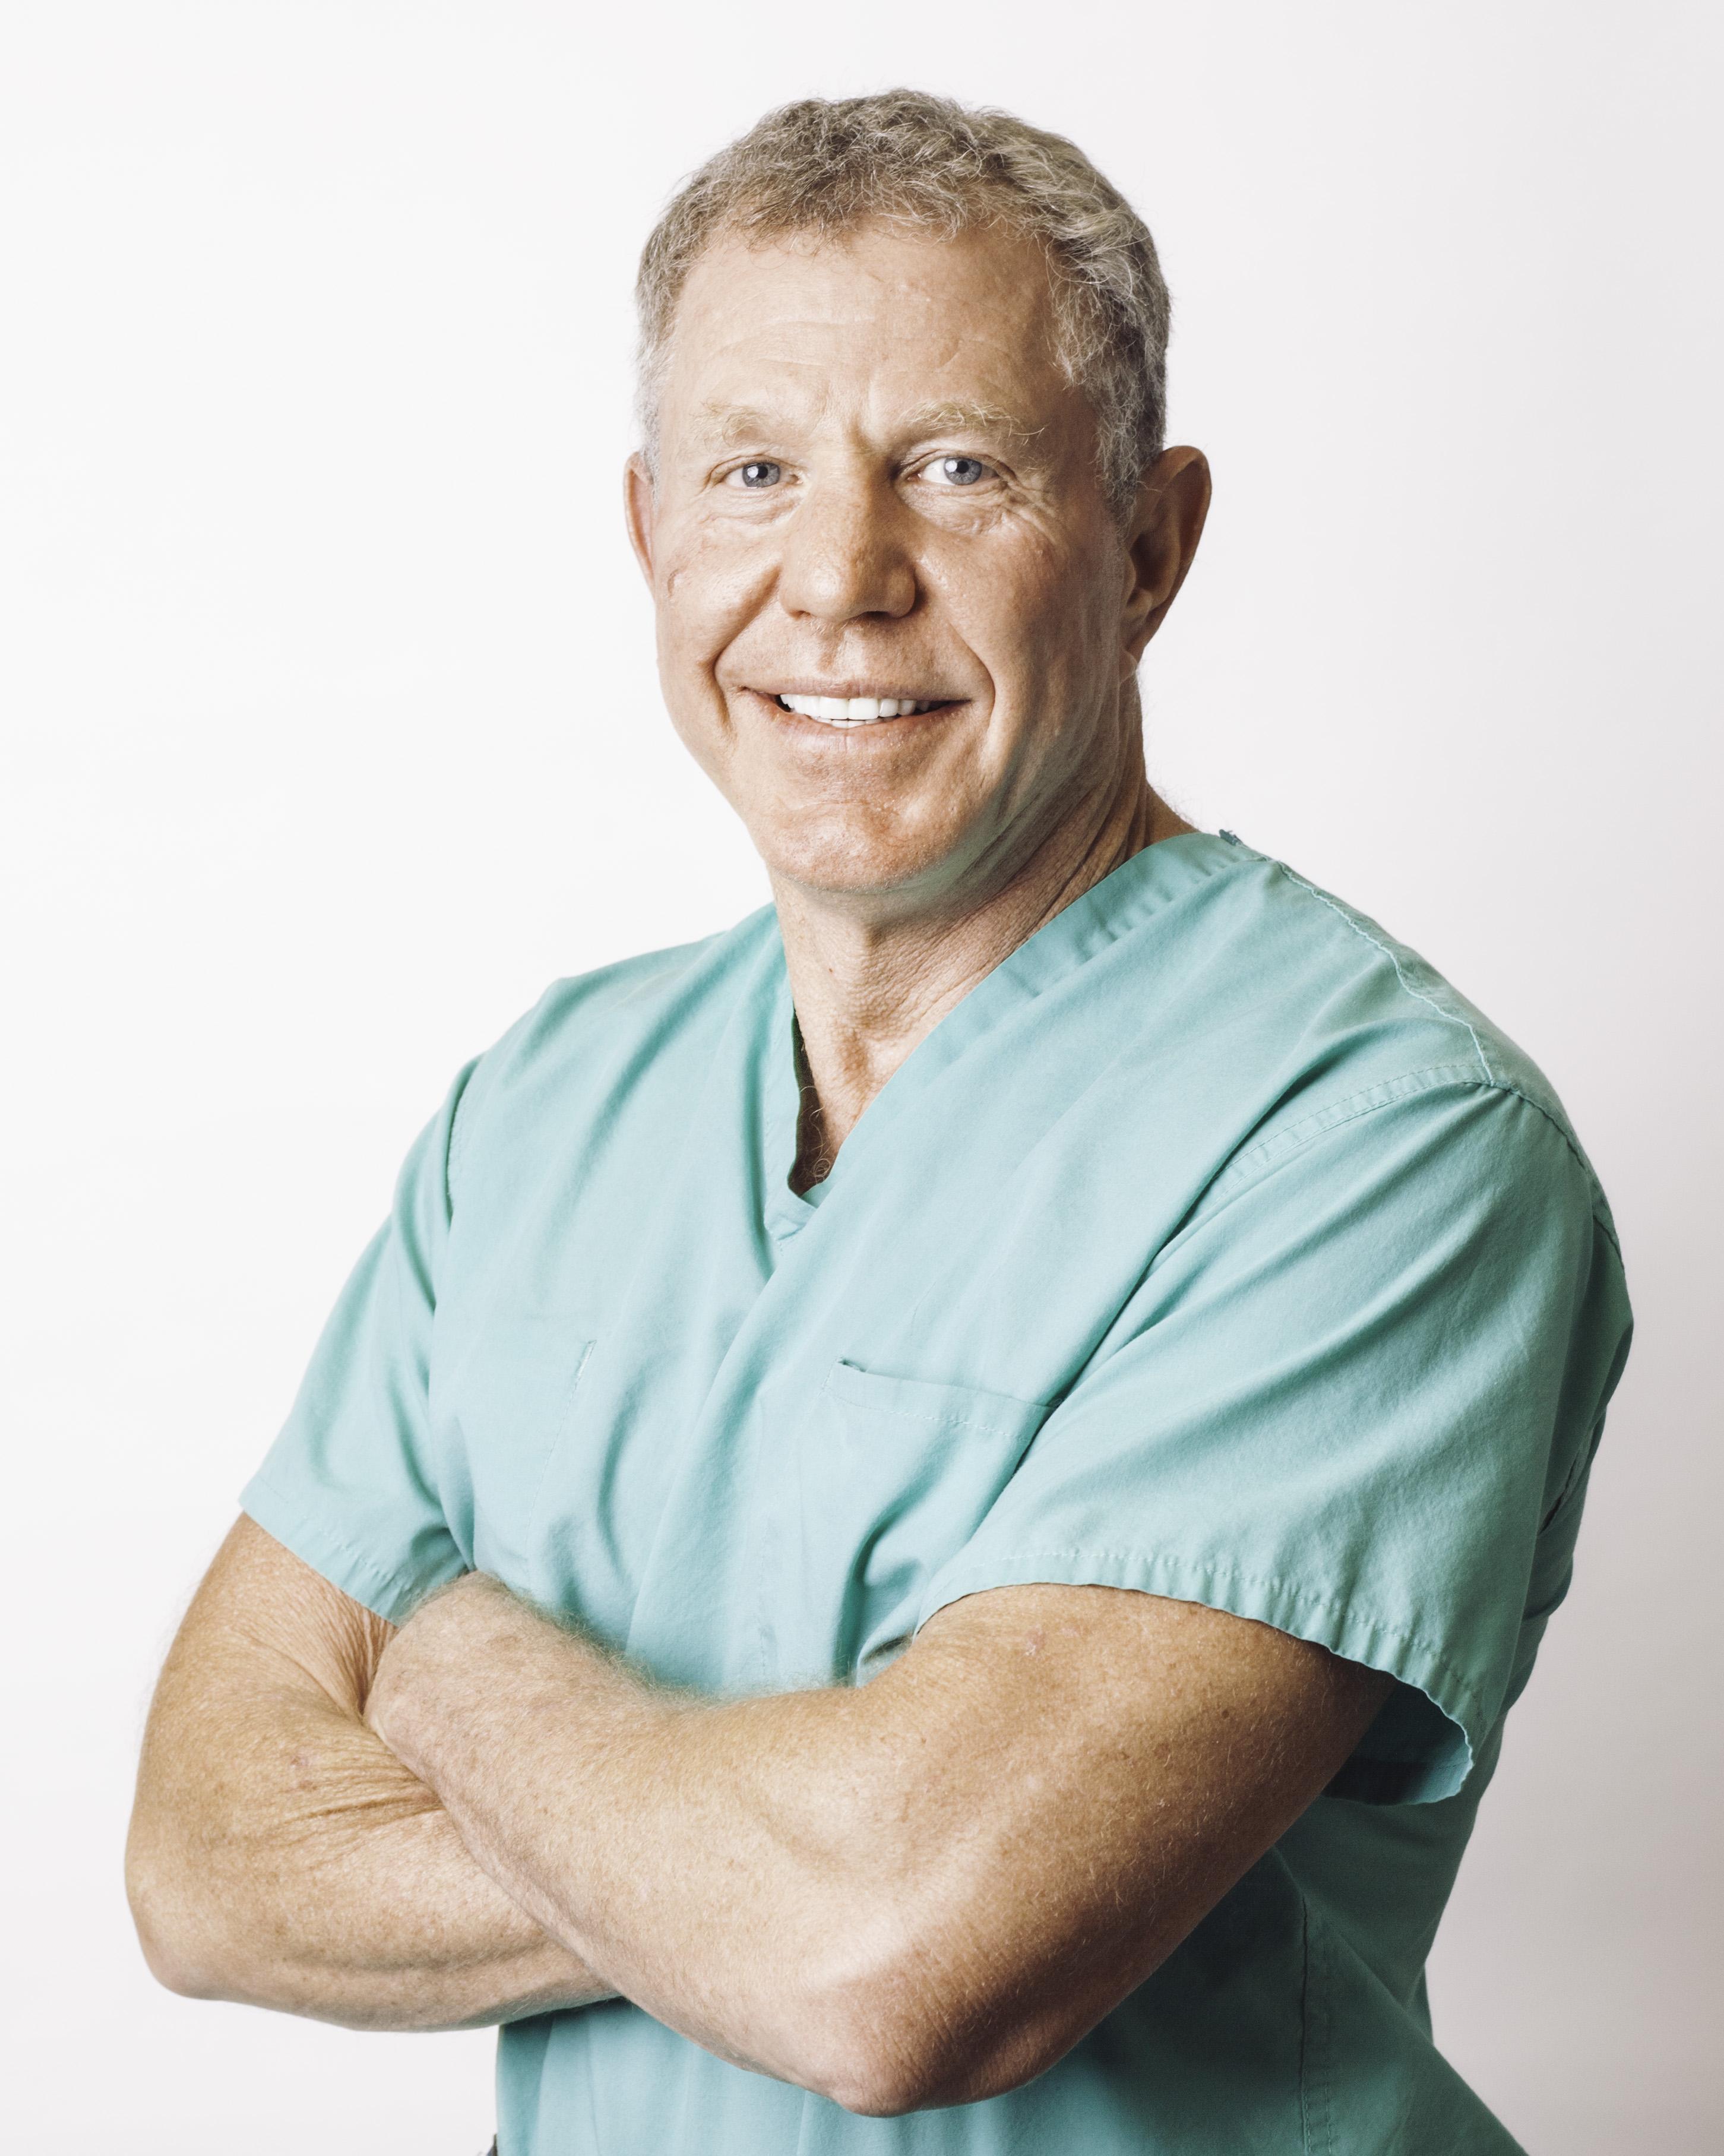 Orthopedic Surgeon, Dr. David L. Fox and Staff